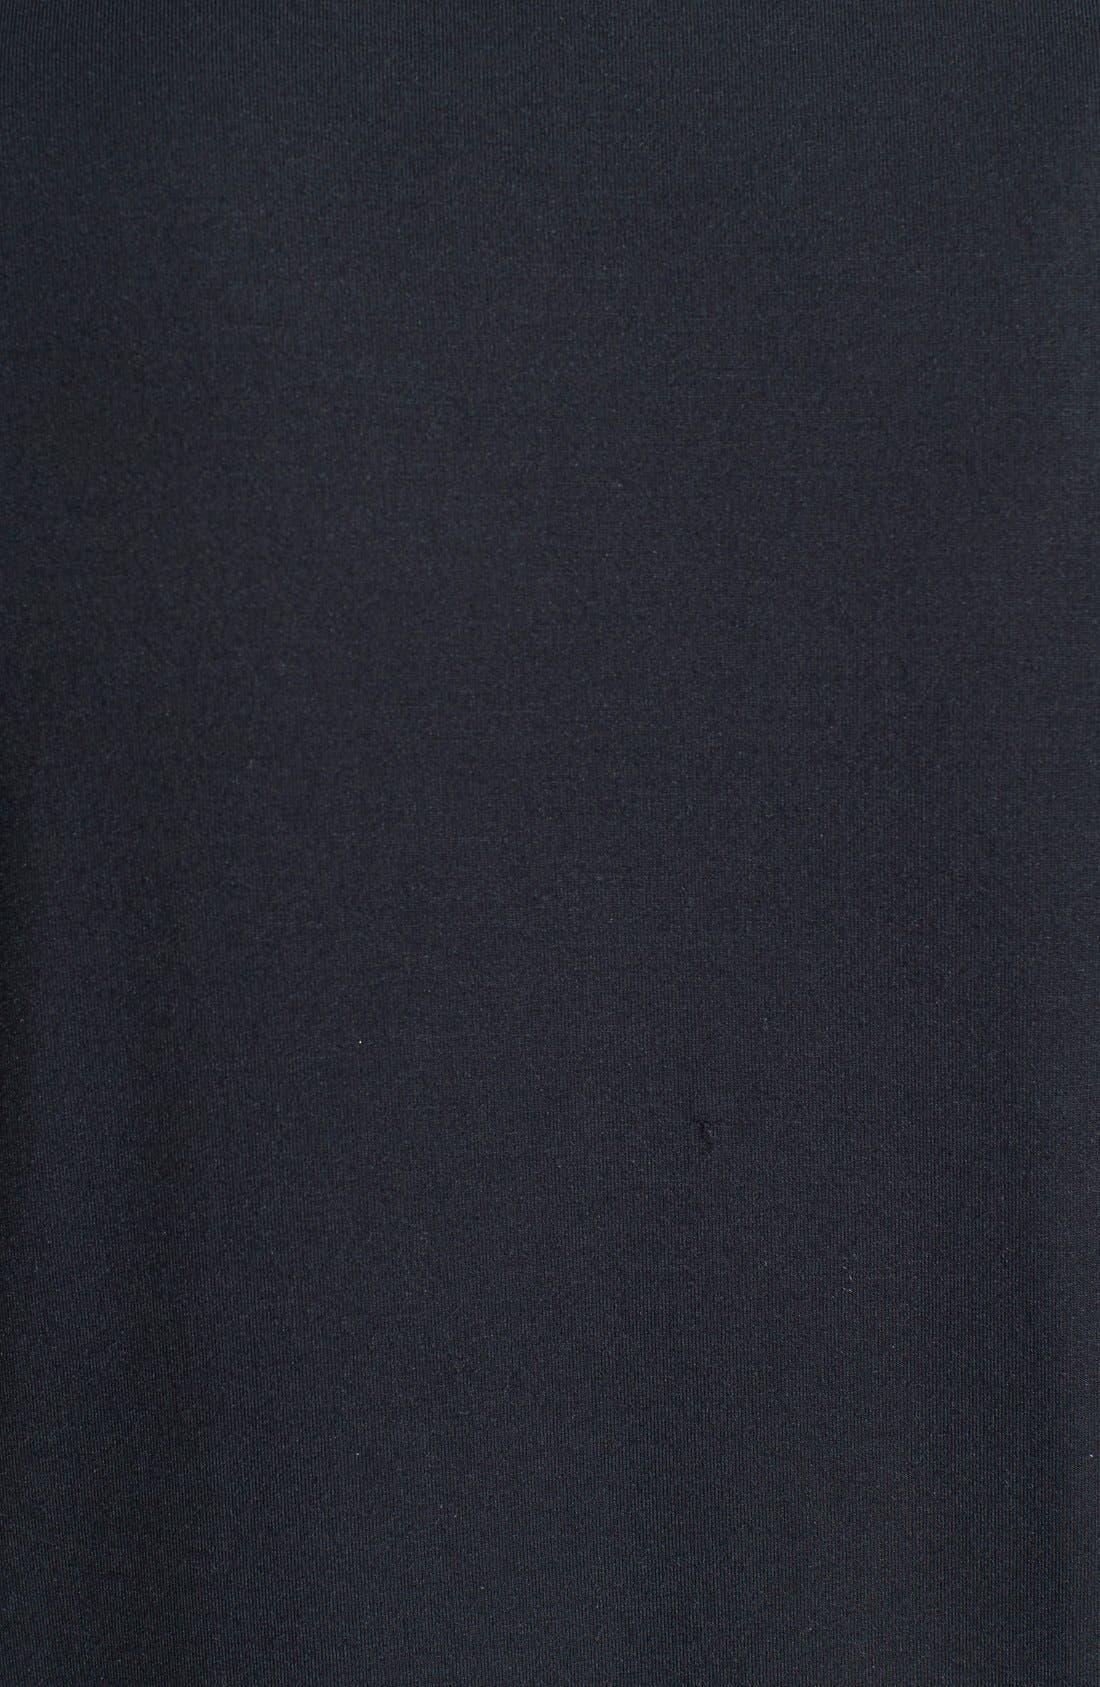 Alternate Image 3  - Nordstrom Lingerie 'Moonlight' Nightshirt